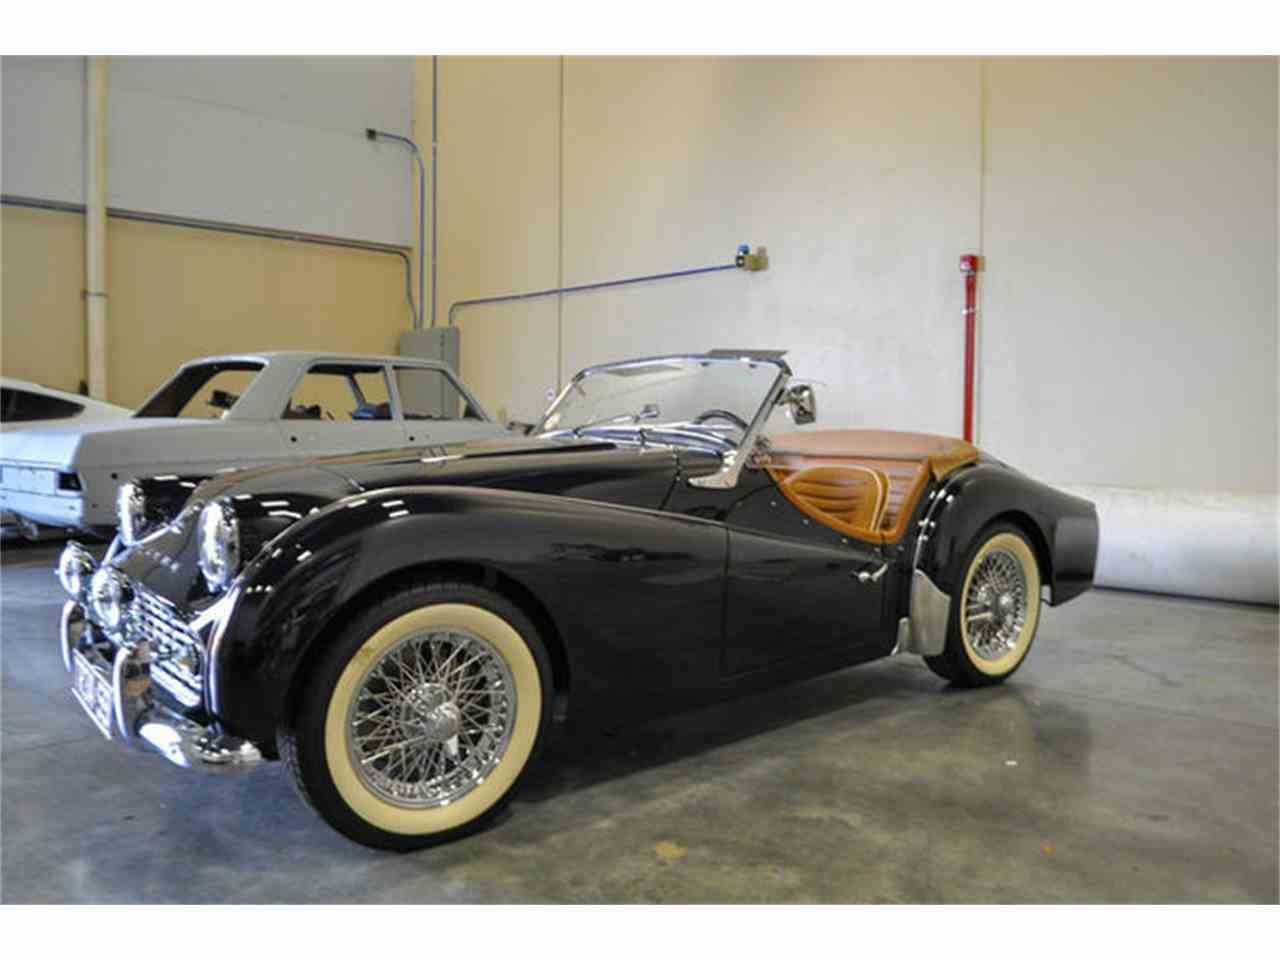 1959 Triumph TR3 for Sale | ClassicCars.com | CC-1055882